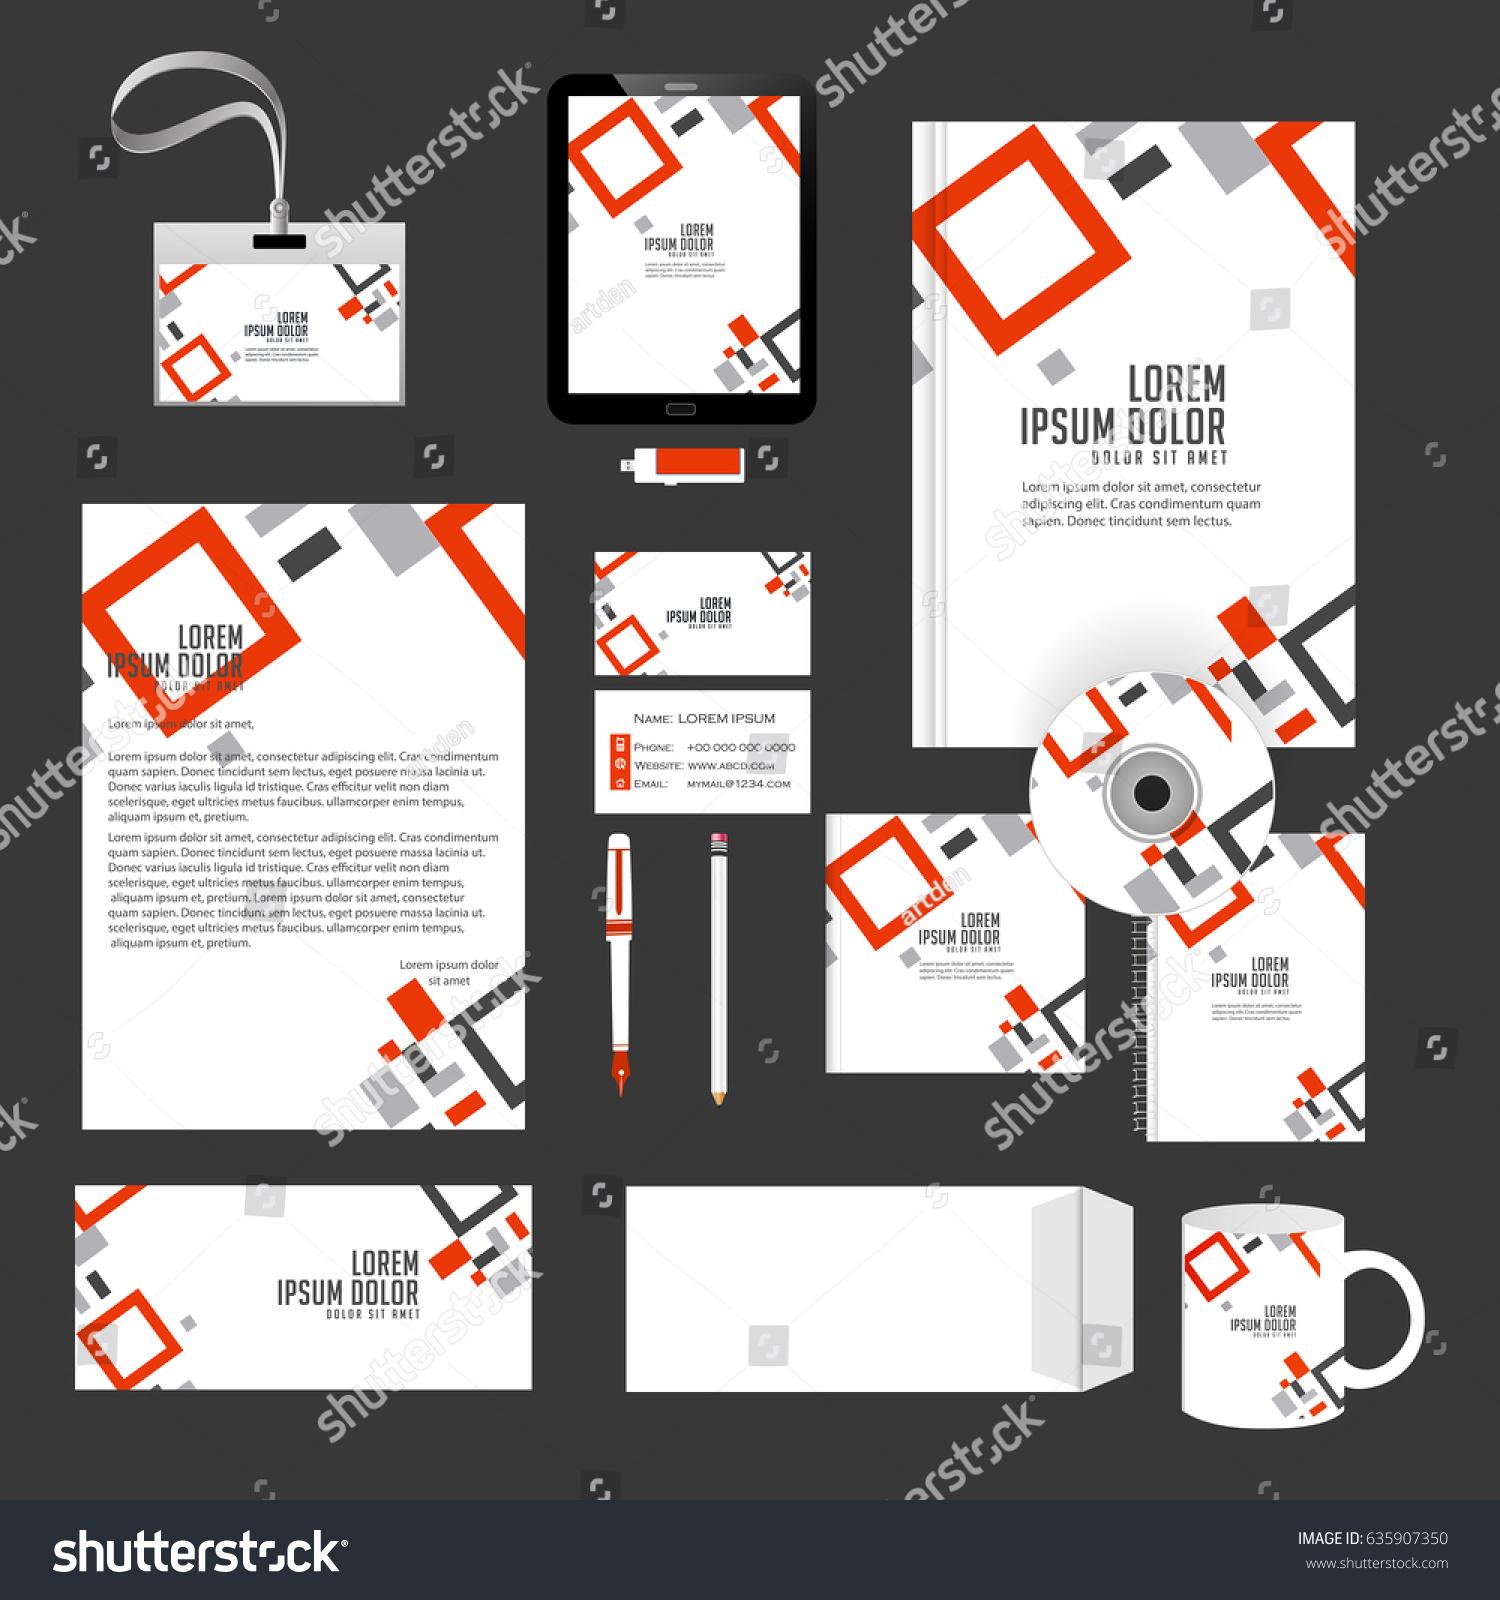 Creative Templates Office Stationery Creative Design Stock Vector ...